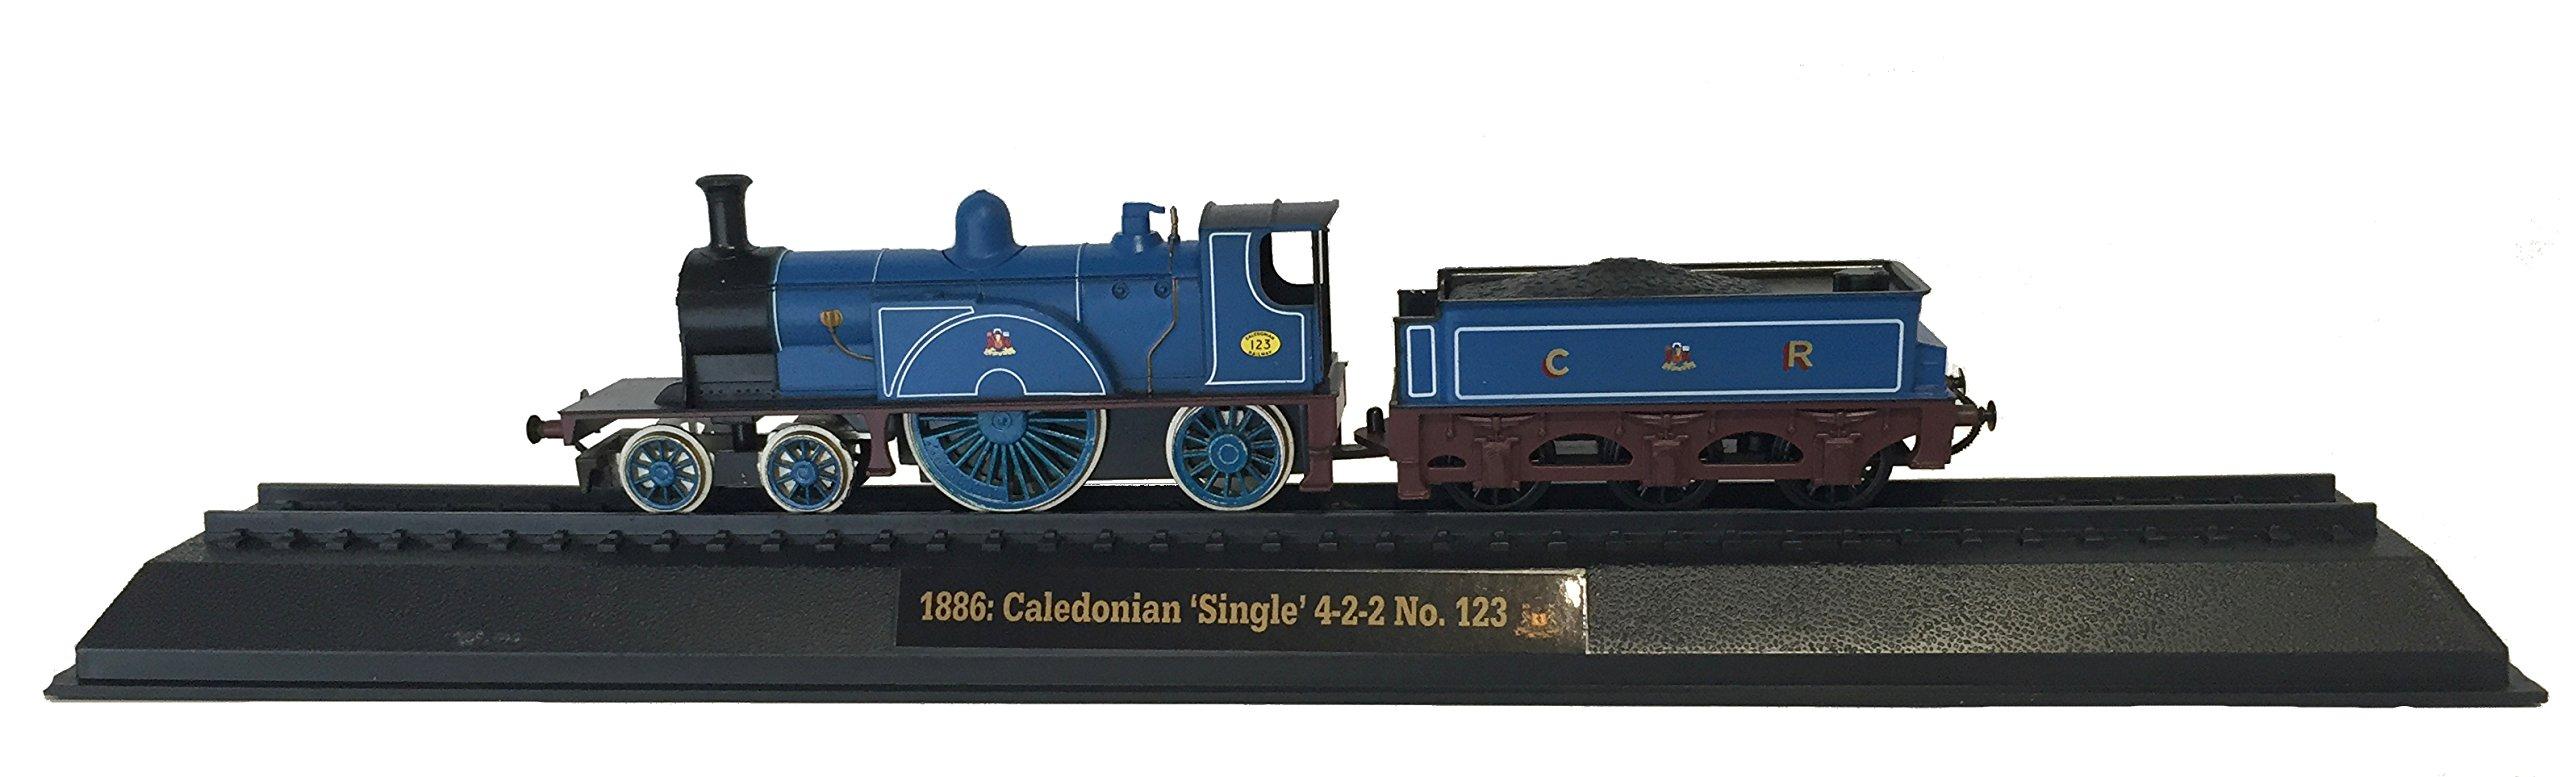 Caledonian 'Single' 4-2-2 No. 123 - 1886 Diecast 1:76 Scale Locomotive Model (Amercom OO-23)